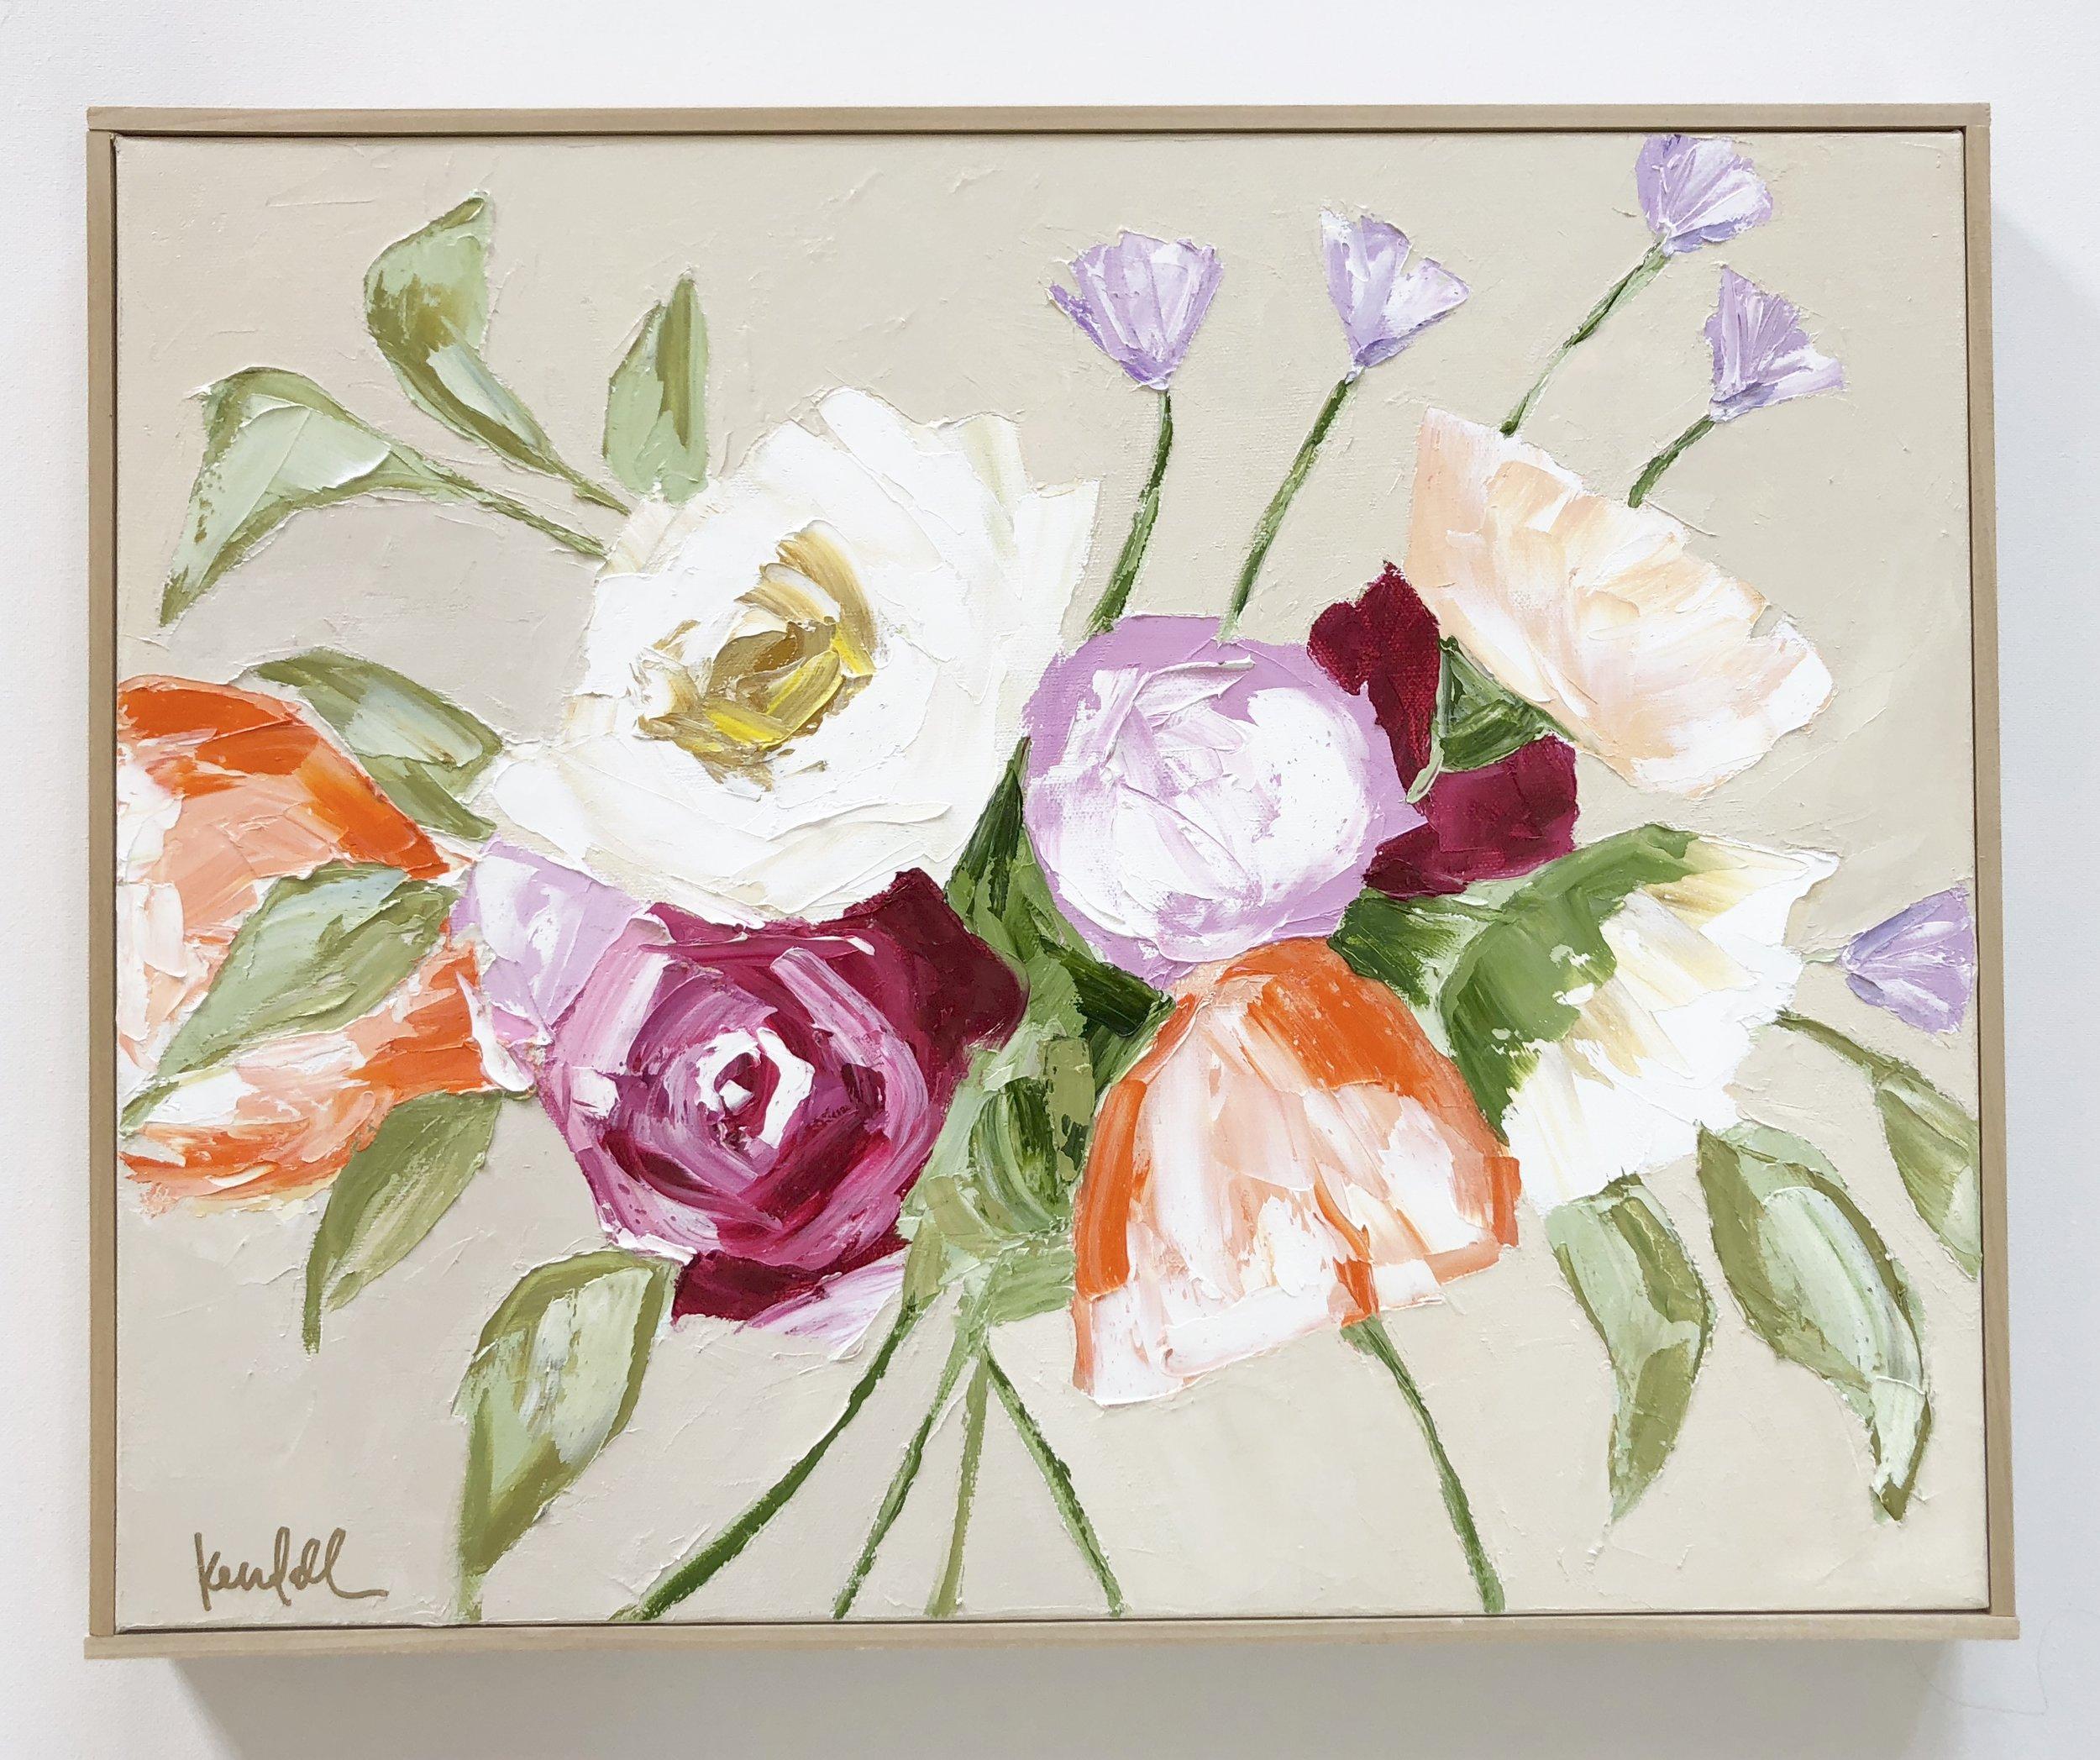 'Soft & Sweet' | 16 x 20 | $475